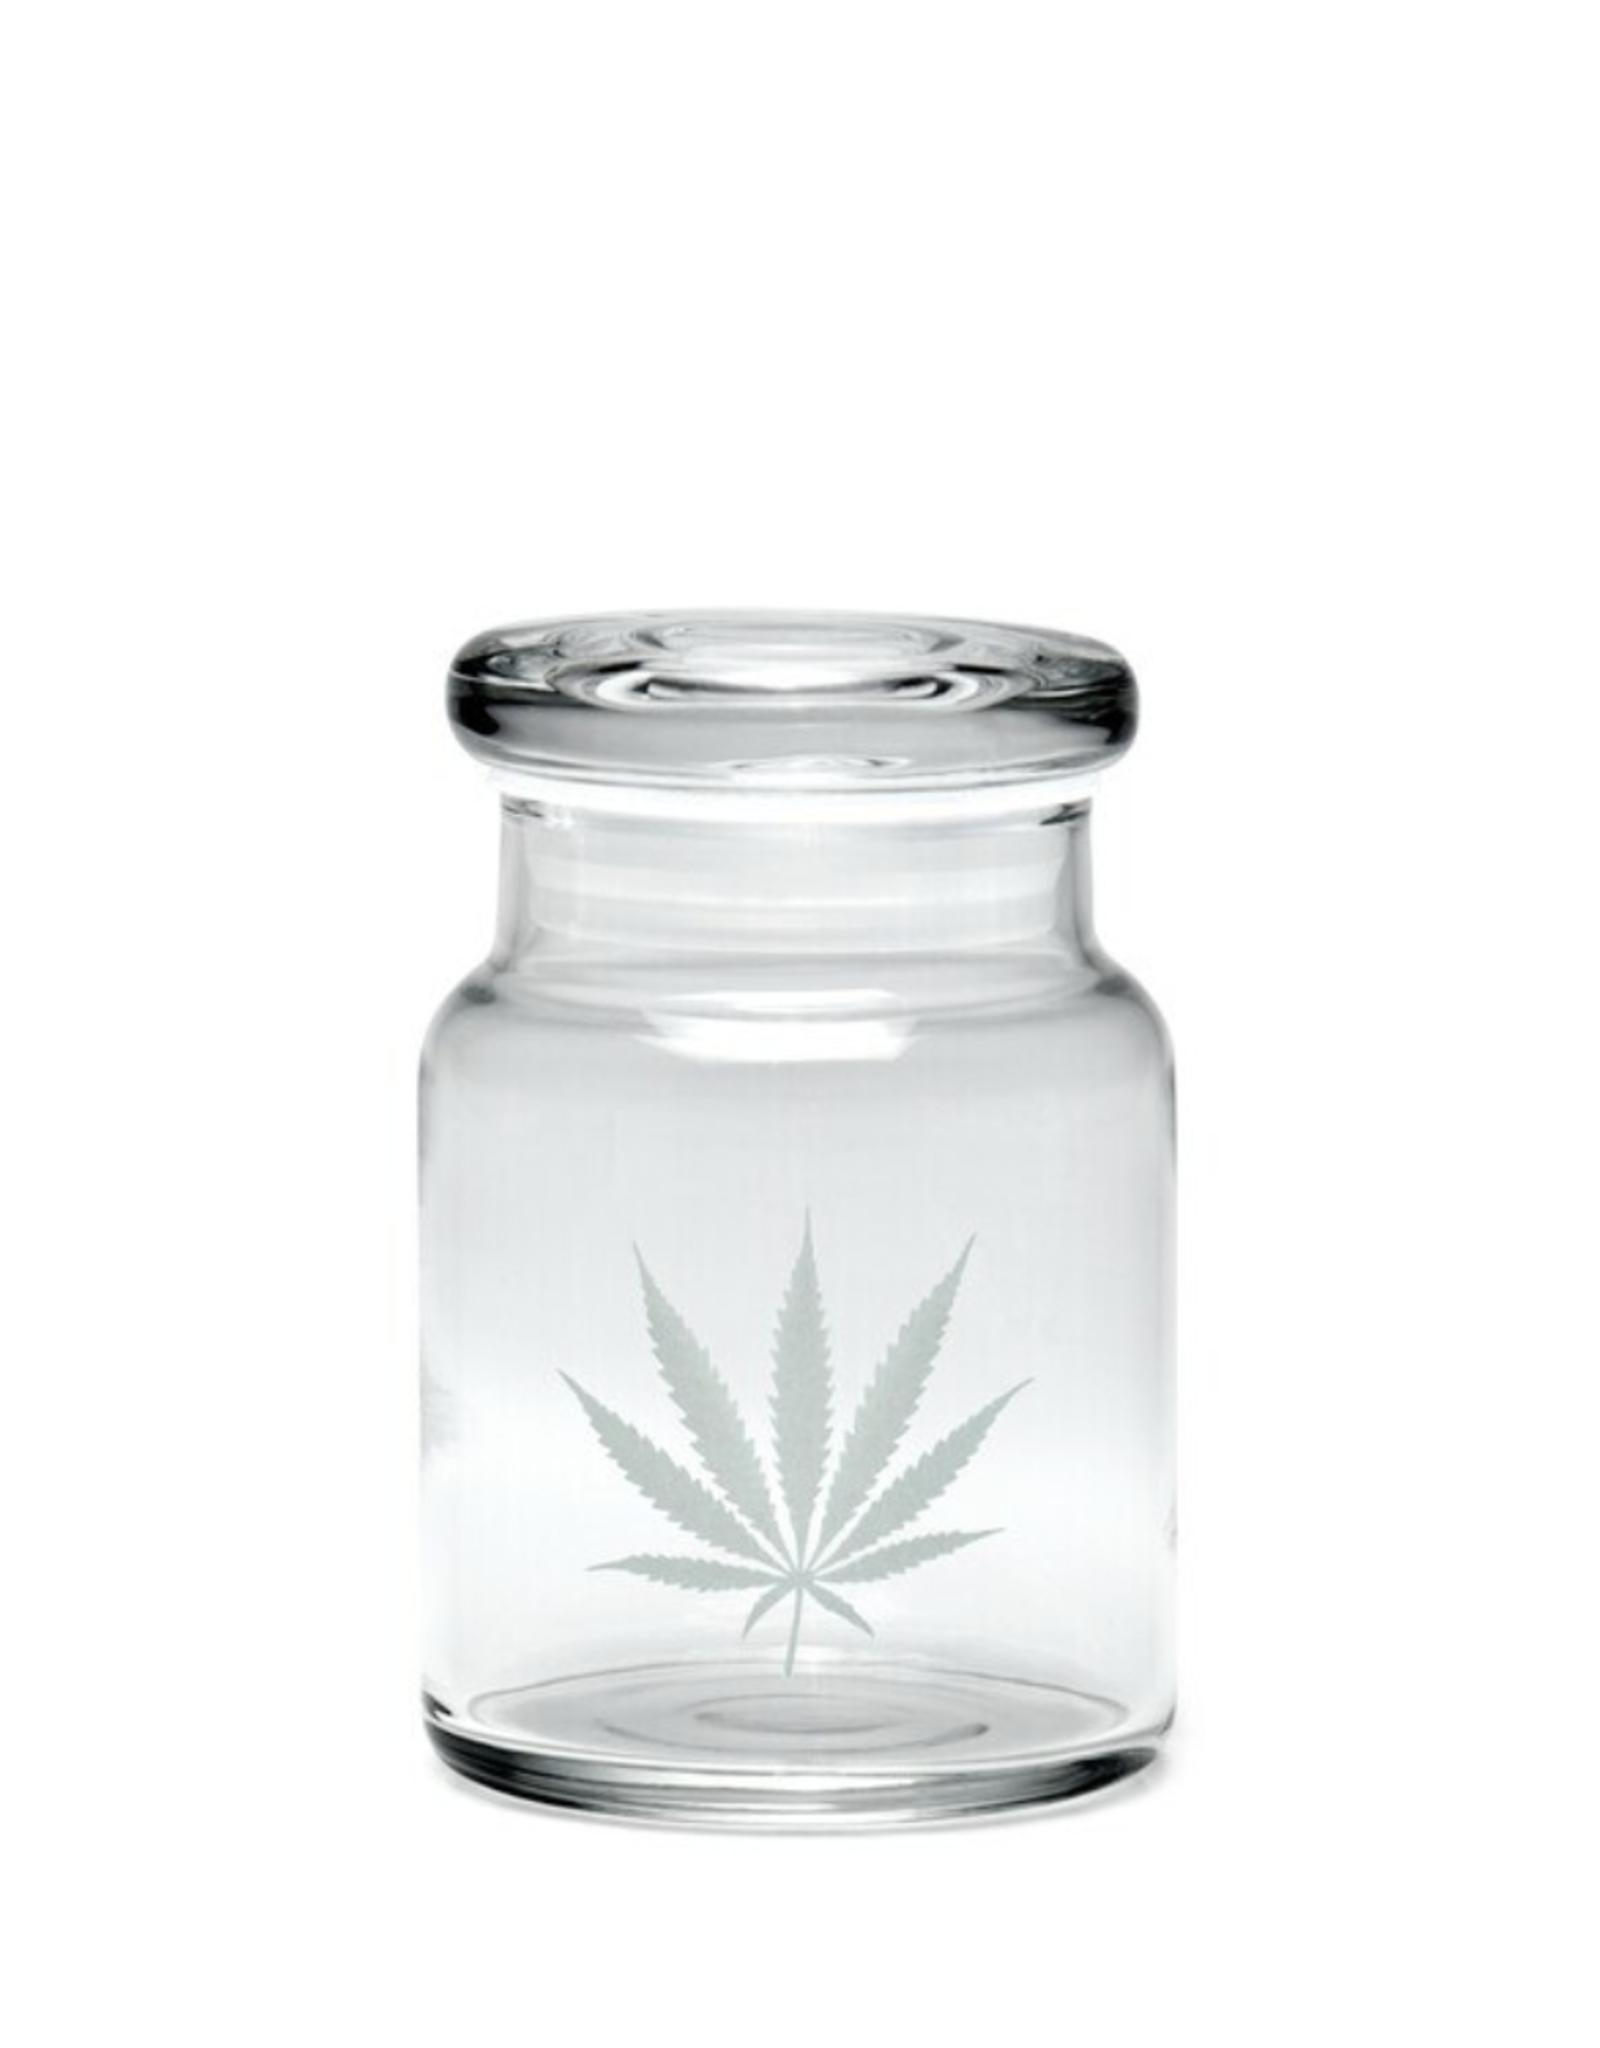 420 Science Small Pop Top Jar - Silver Leaf